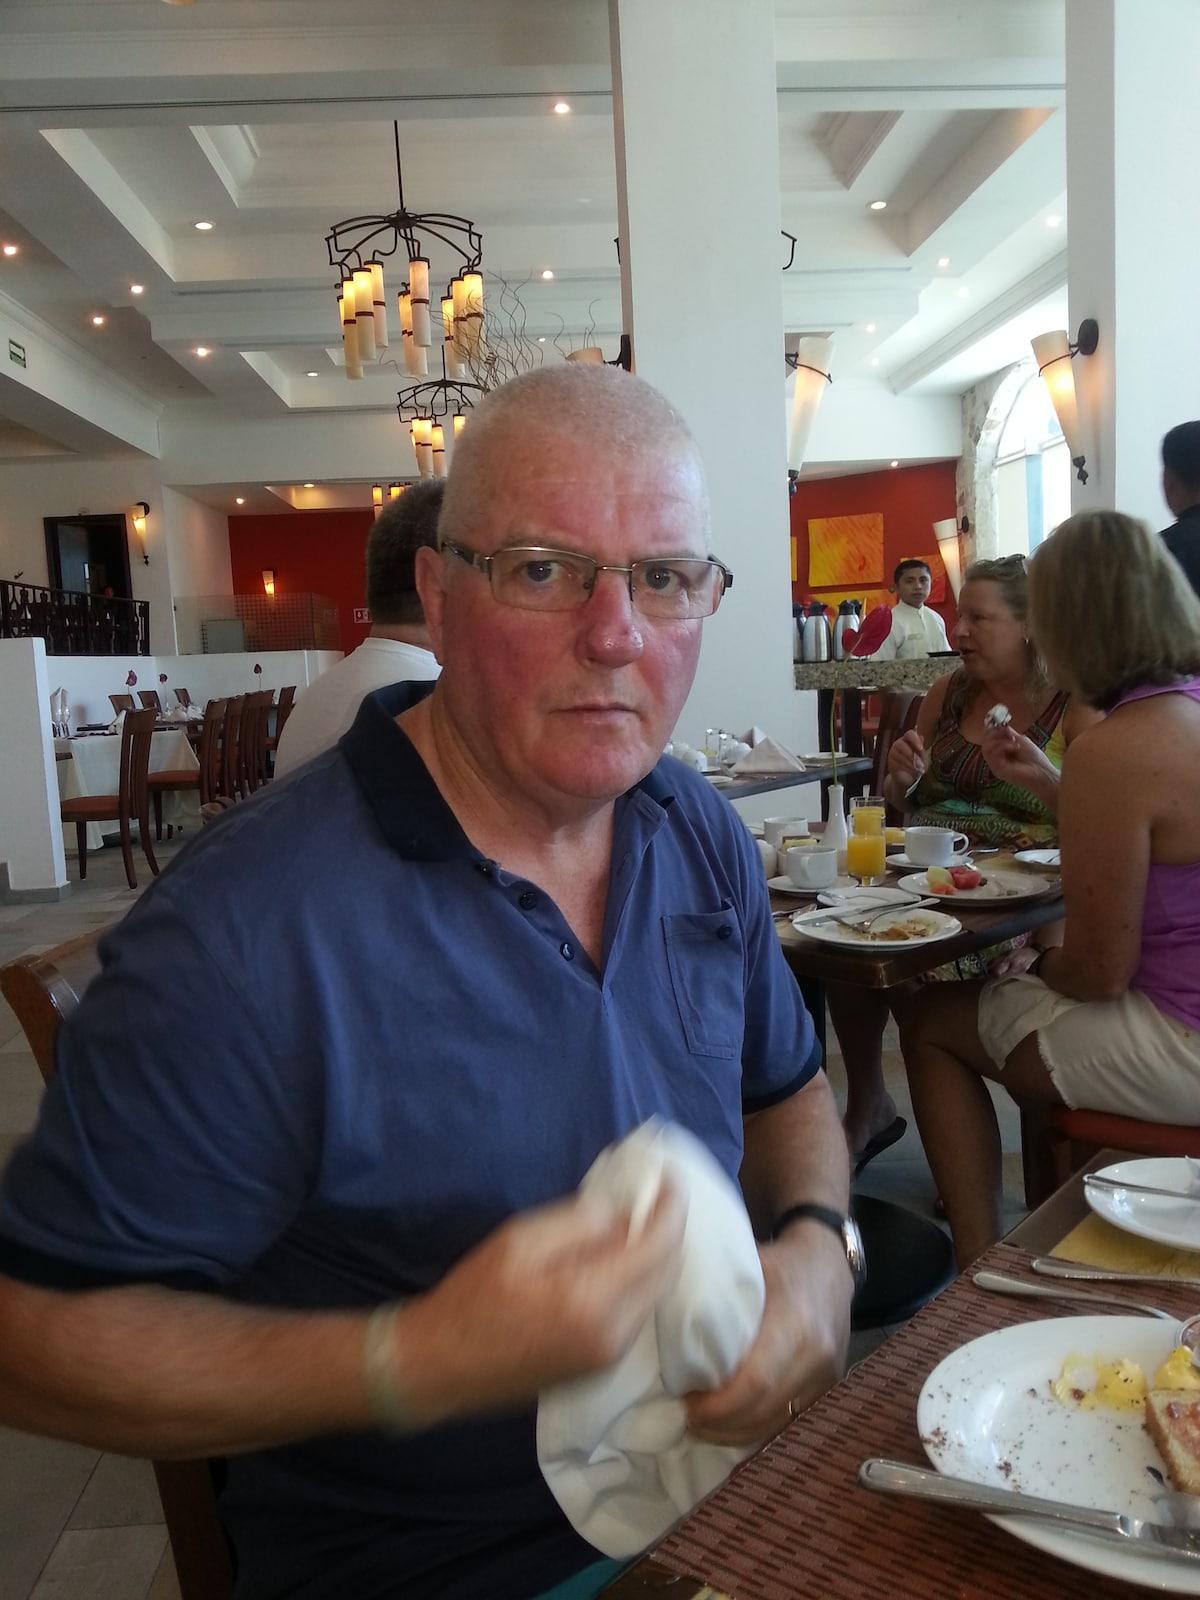 Martin From Benidorm, Spain